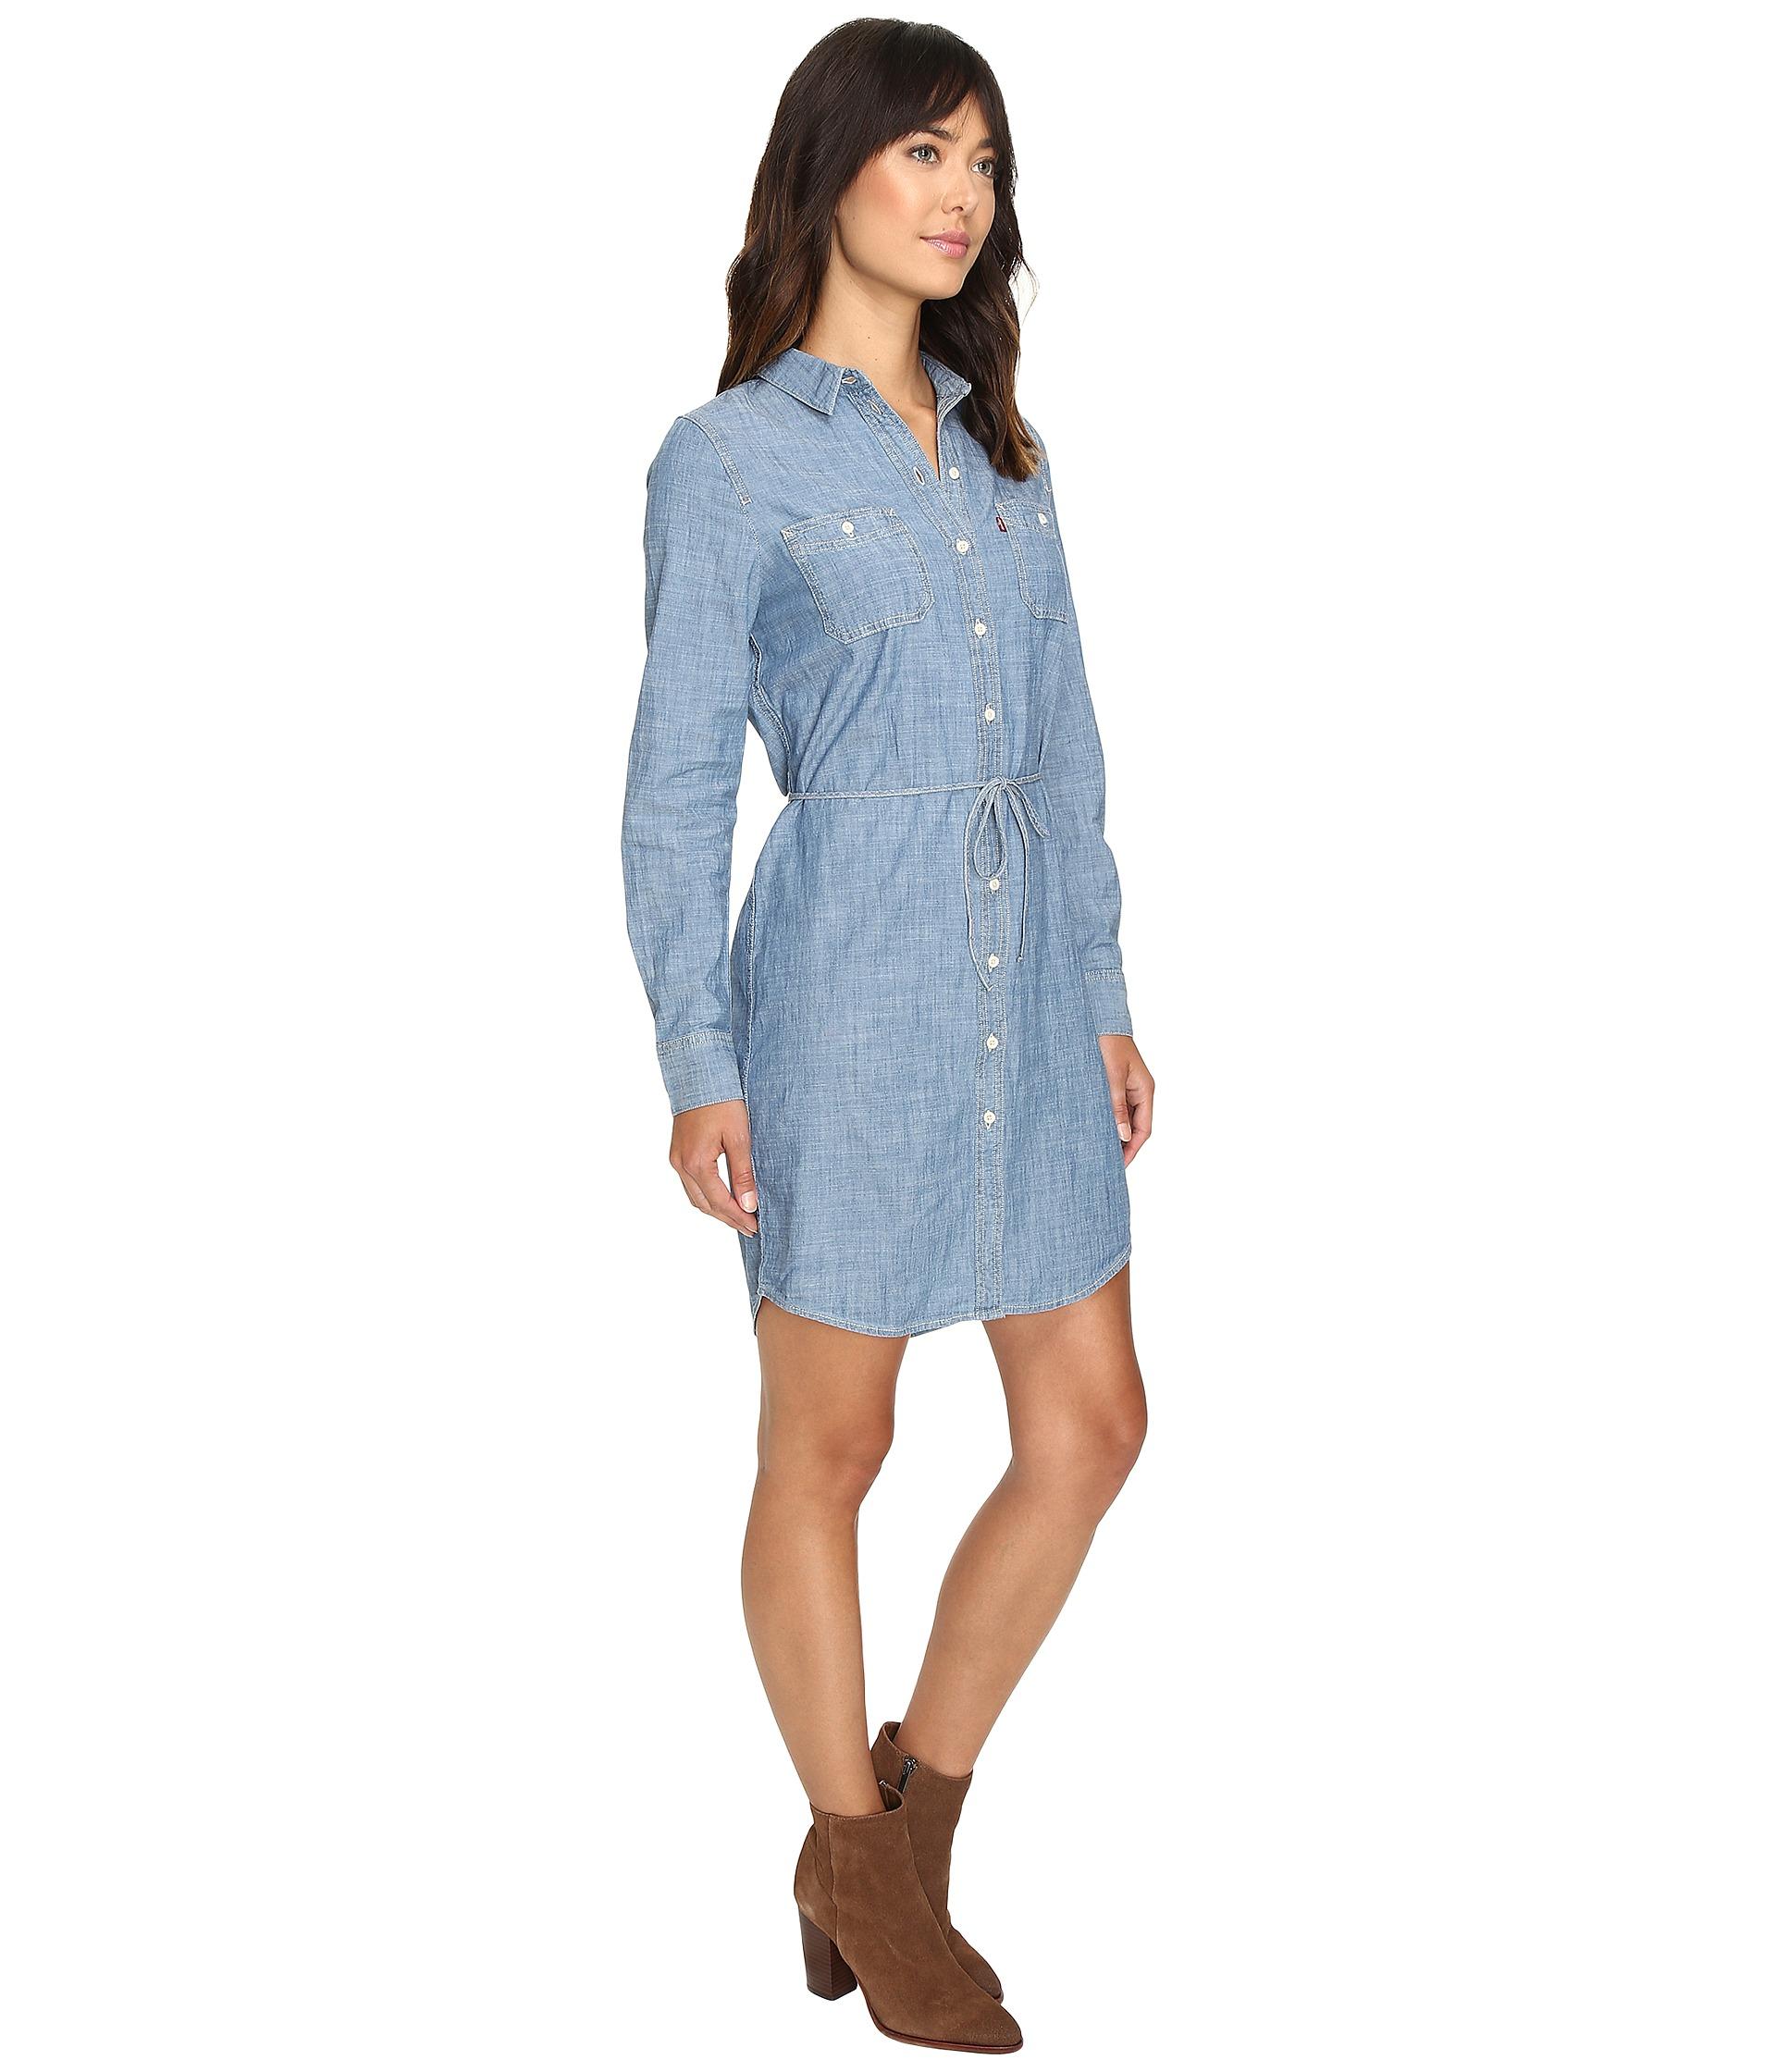 Levi's® Womens Workwear Dress at Zappos.com